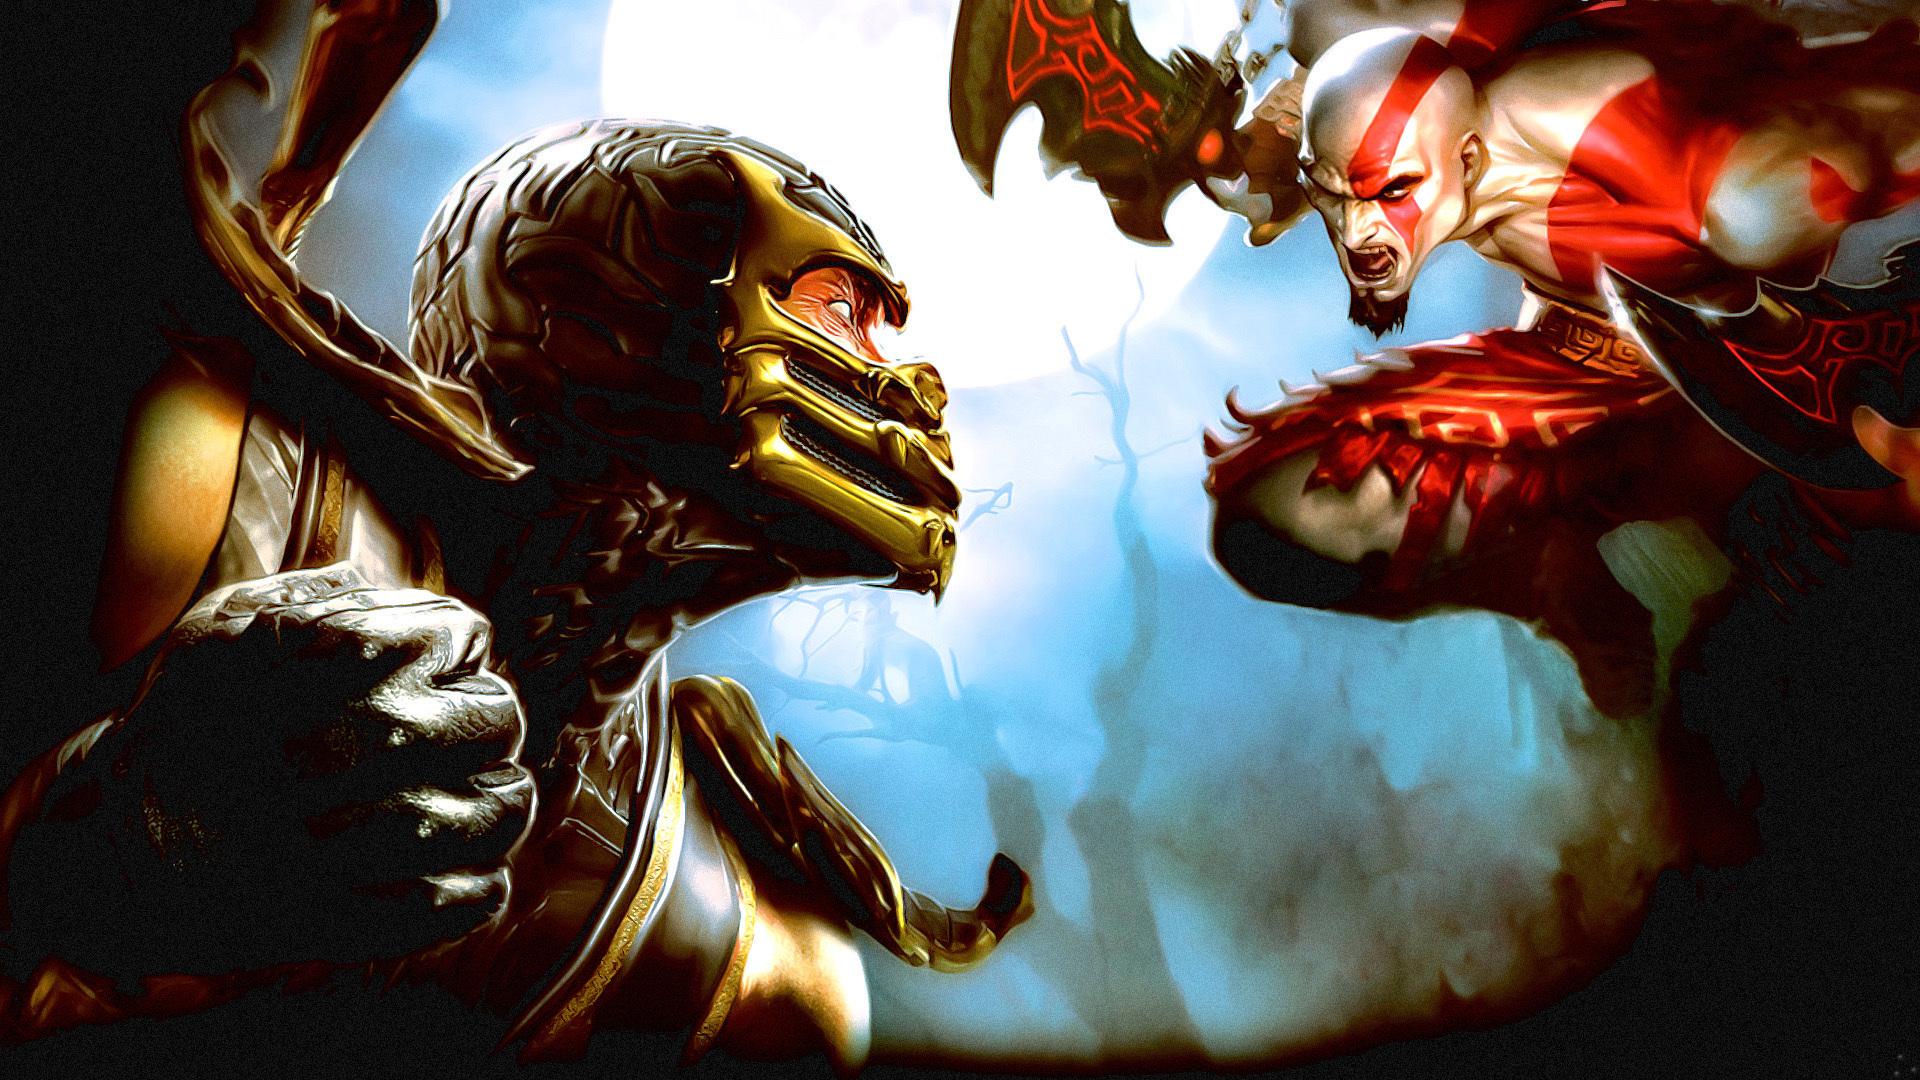 Scorpion Mortal Combat Wallpaper 557 Wallpaper WallpaperLepi 1920x1080